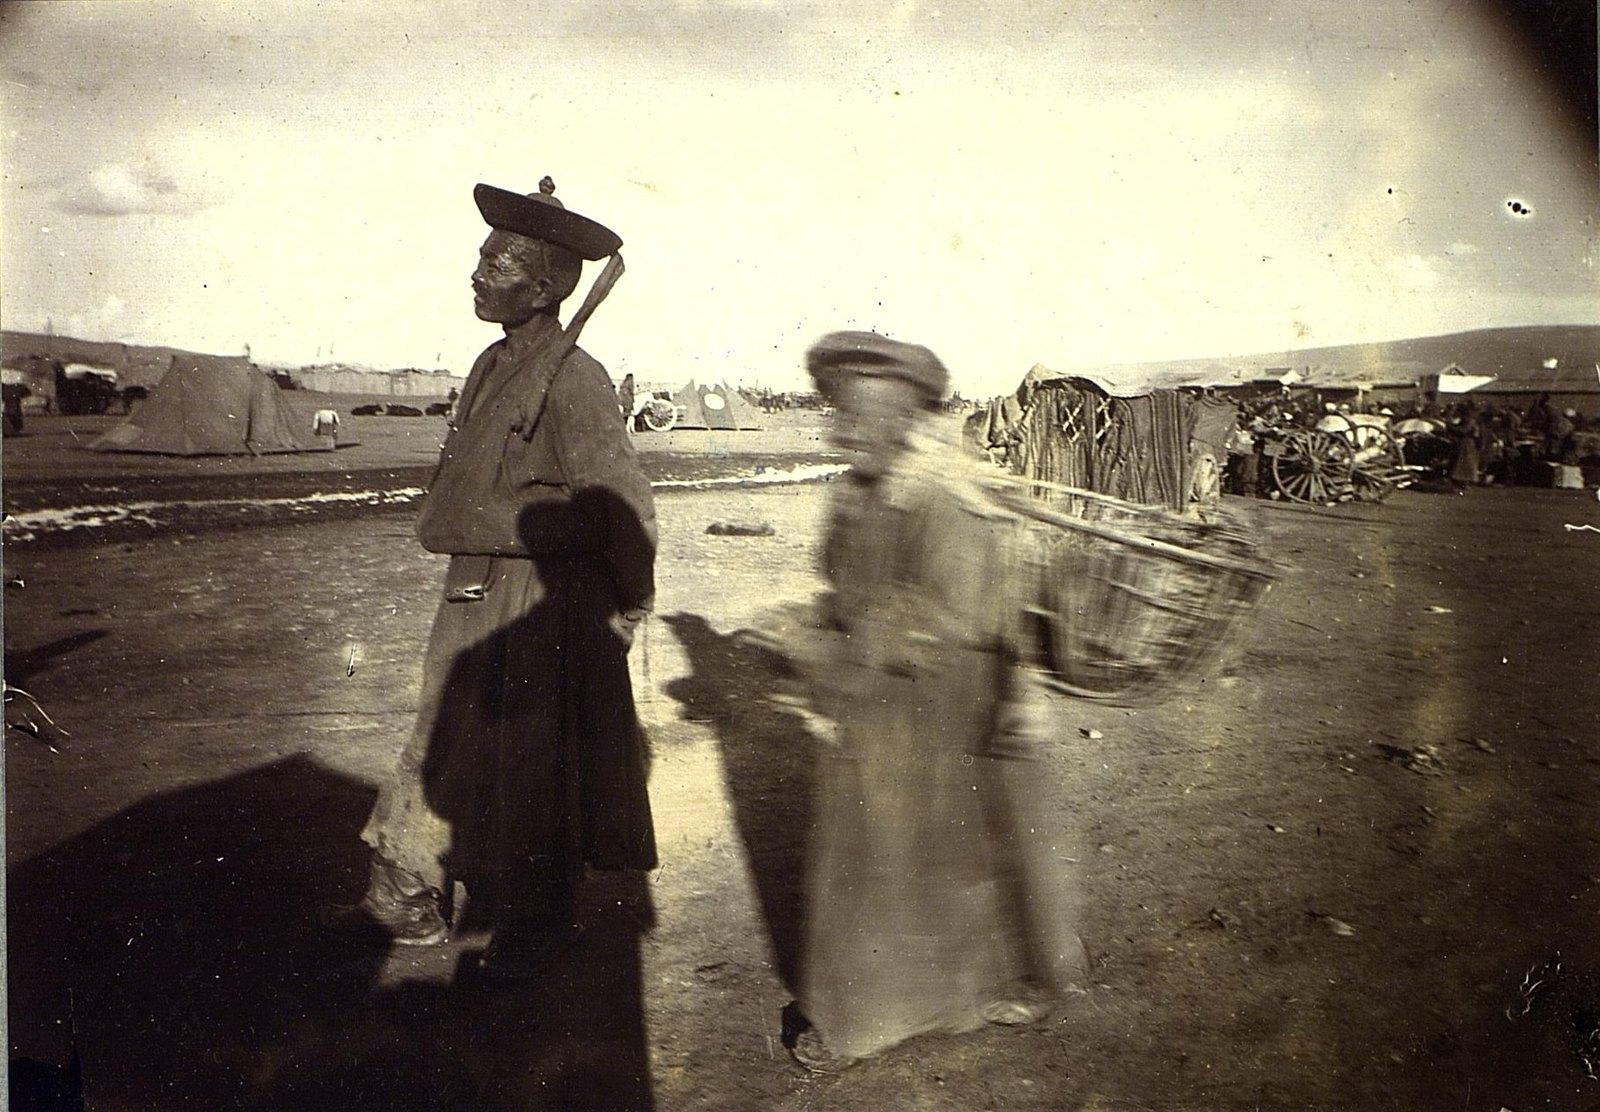 Урга. Монгол и аргальщица (продавщица топлива из сухого помета)